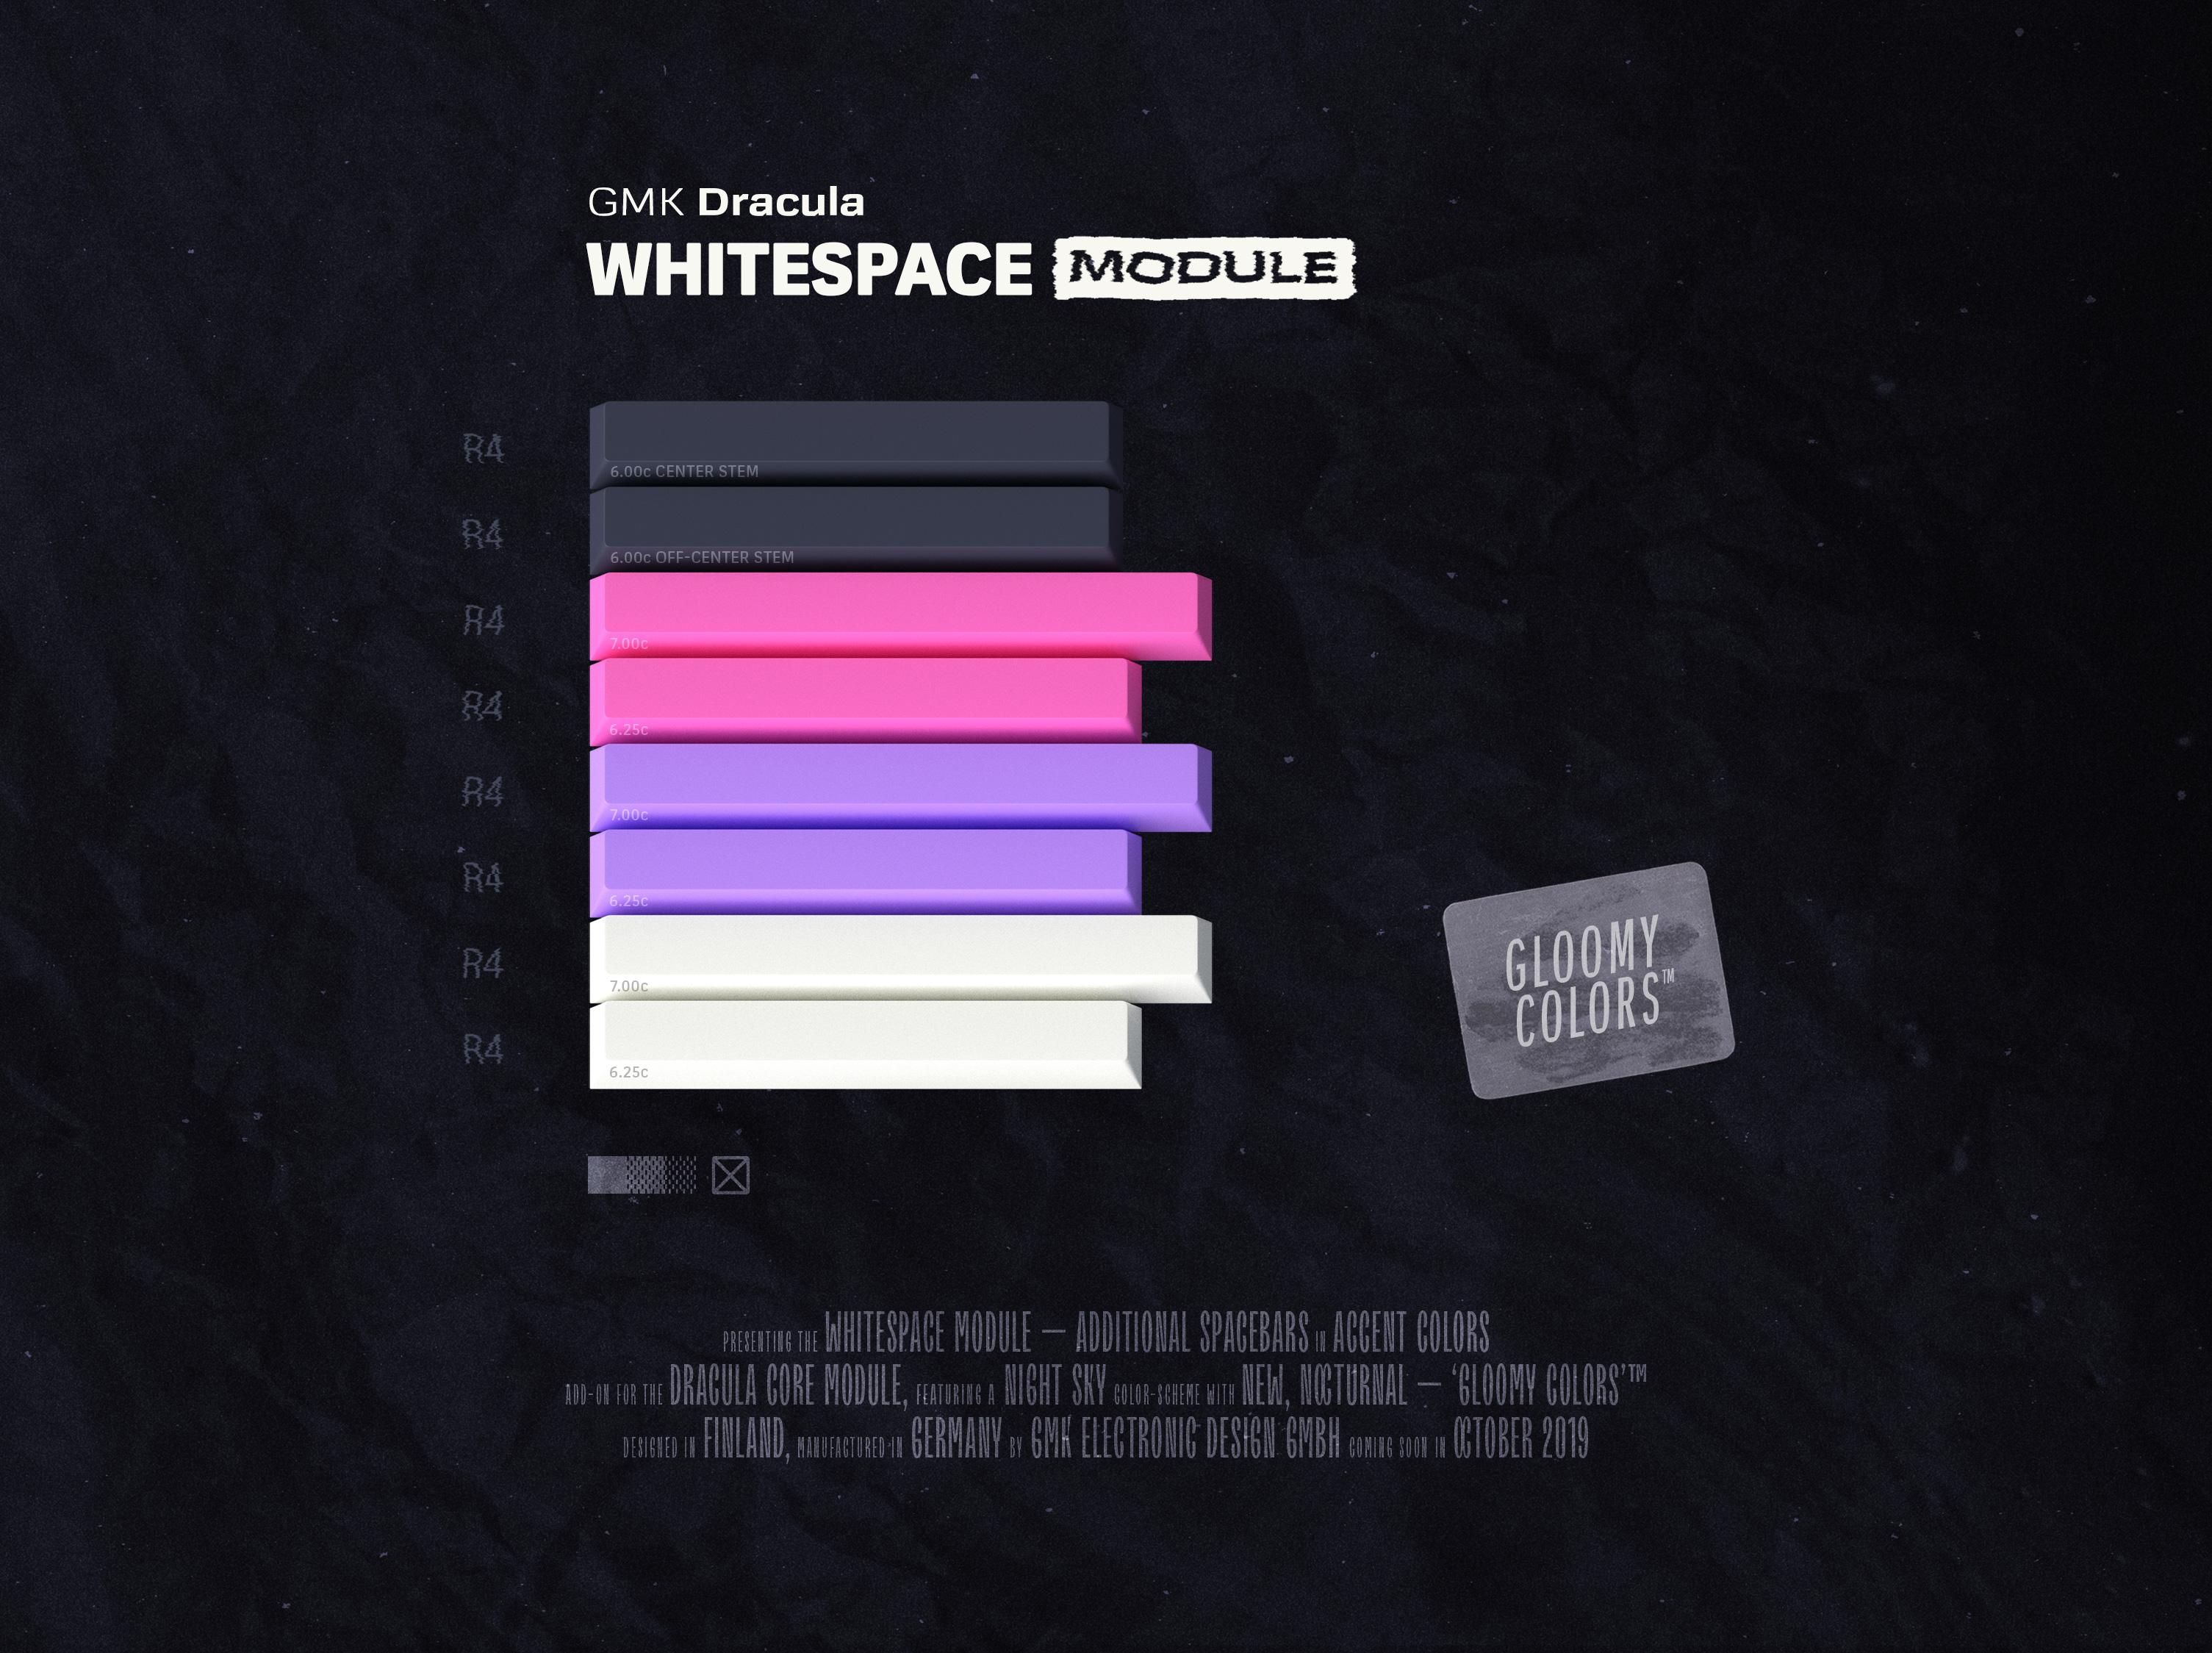 Whitespace Module